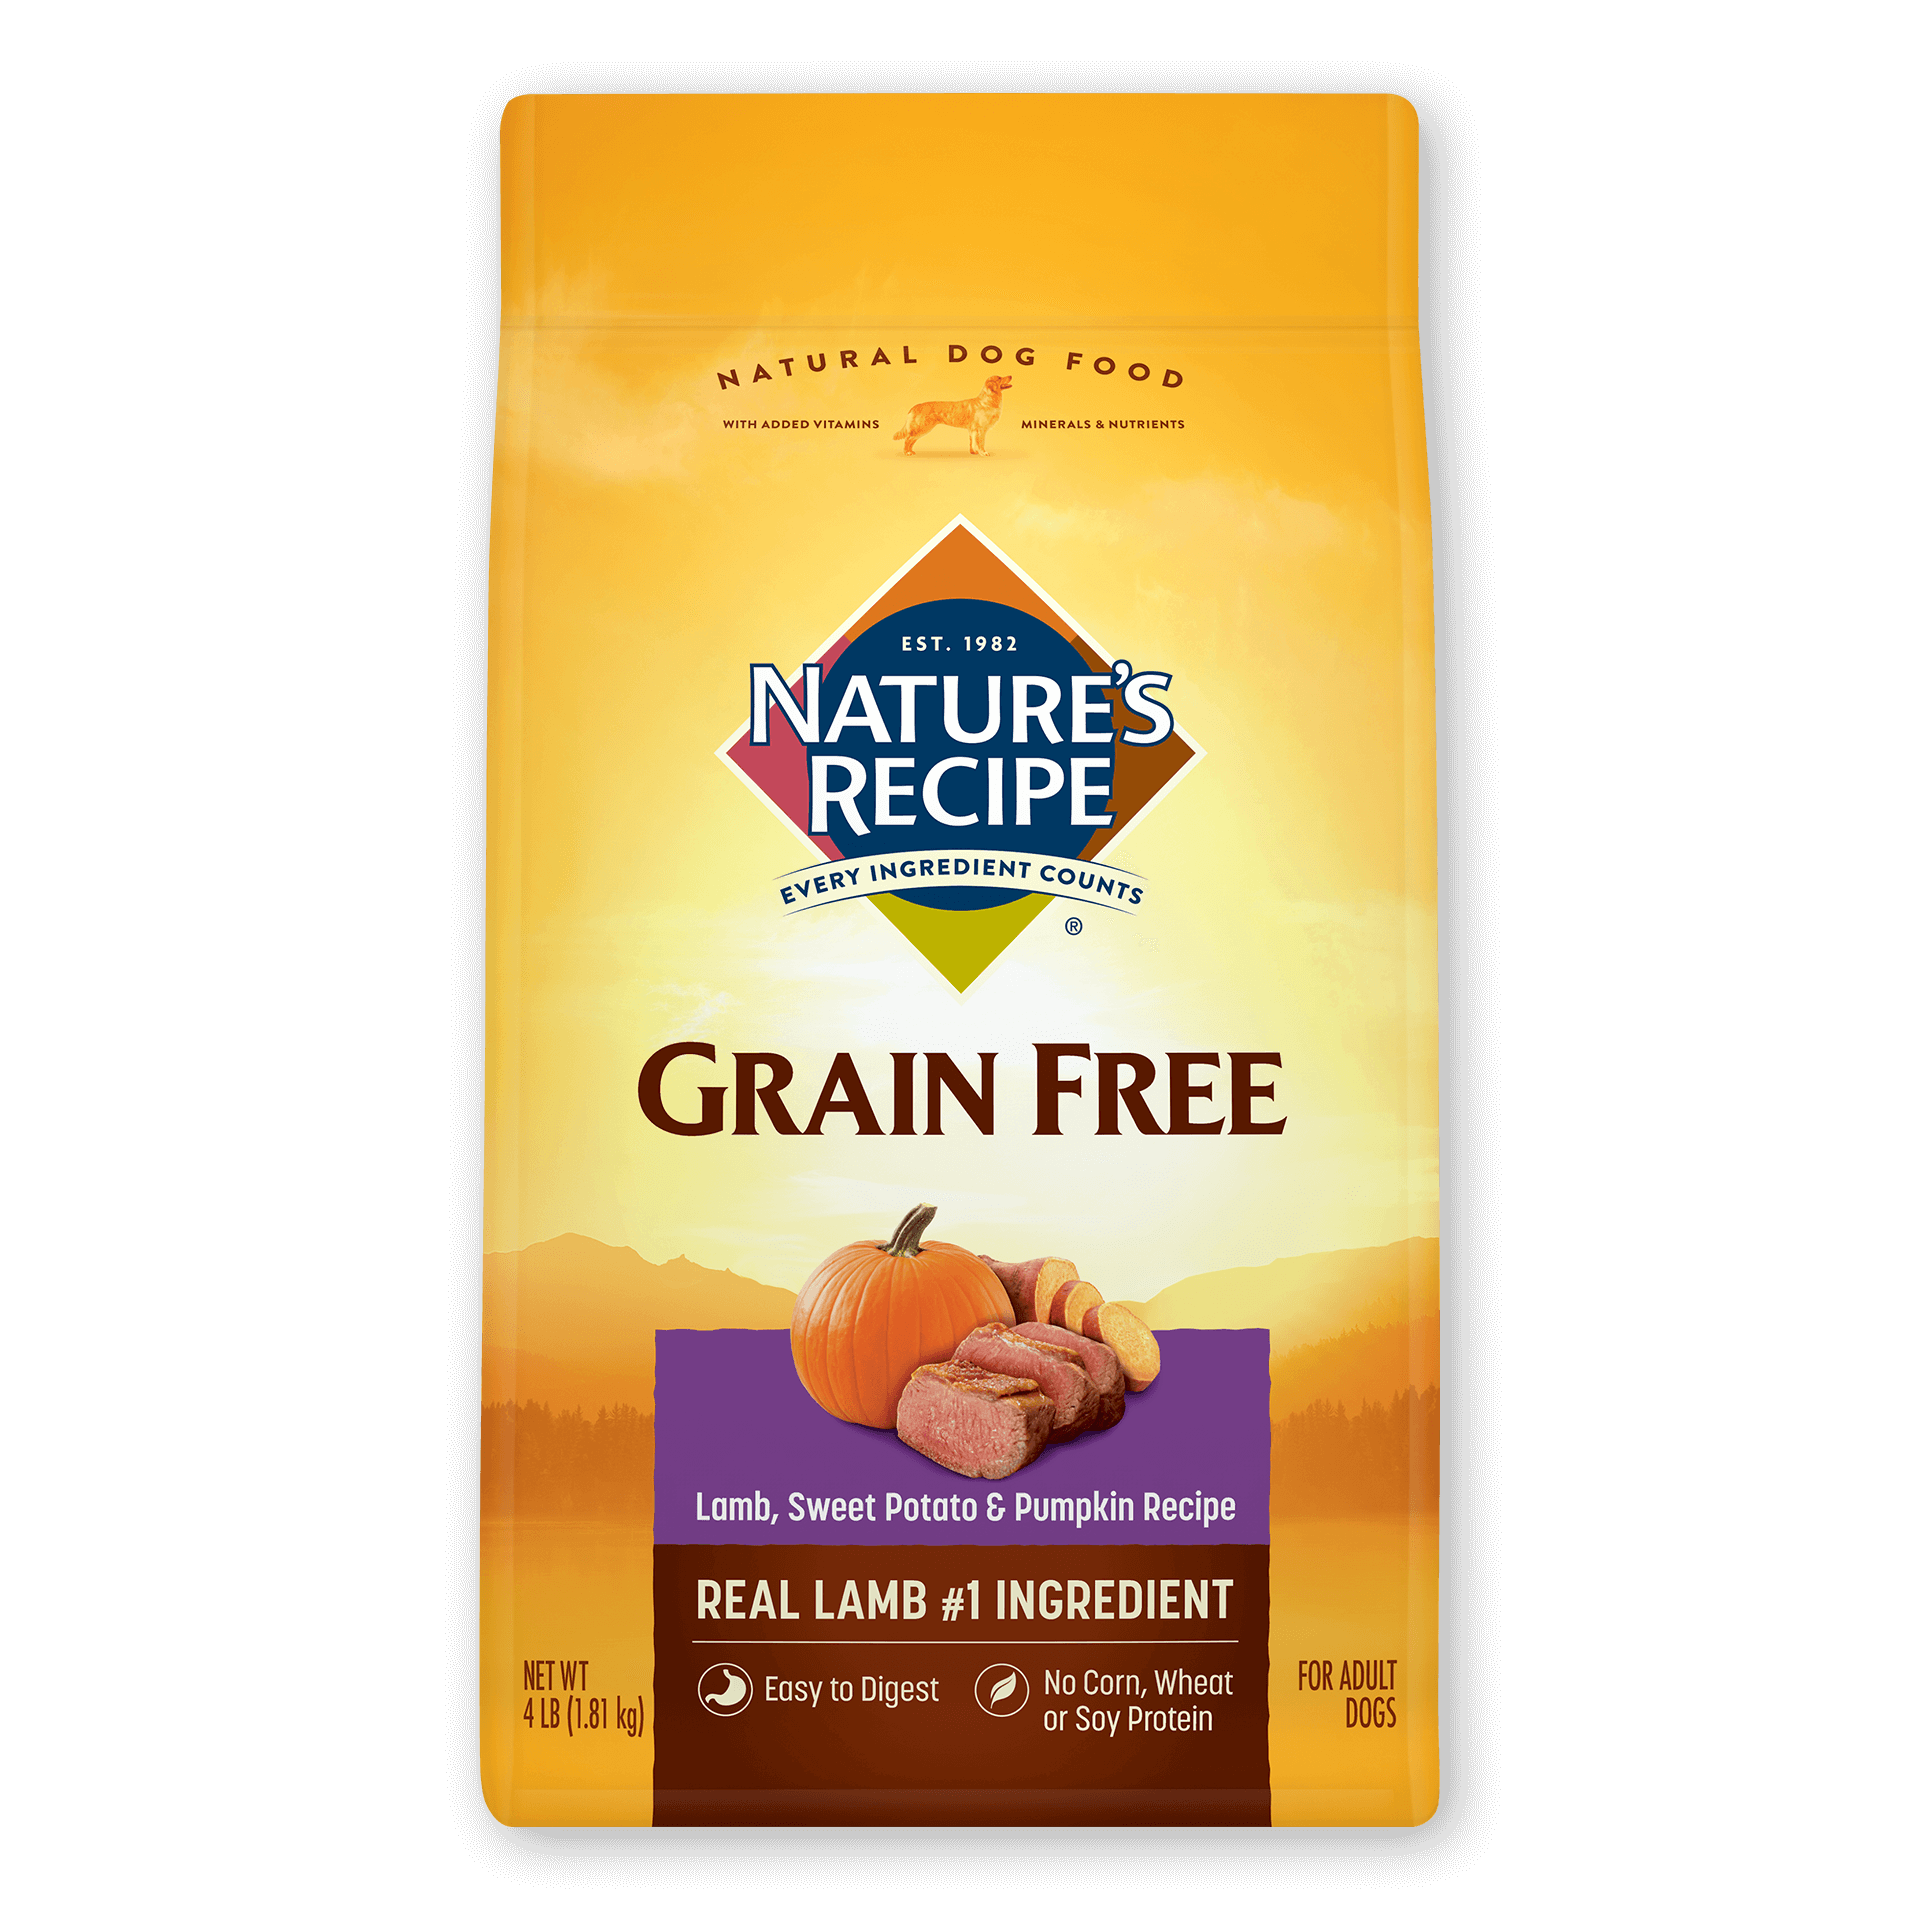 <p>Grain Free Easy to Digest Lamb, Sweet Potato, &amp; Pumpkin Recipe</p>